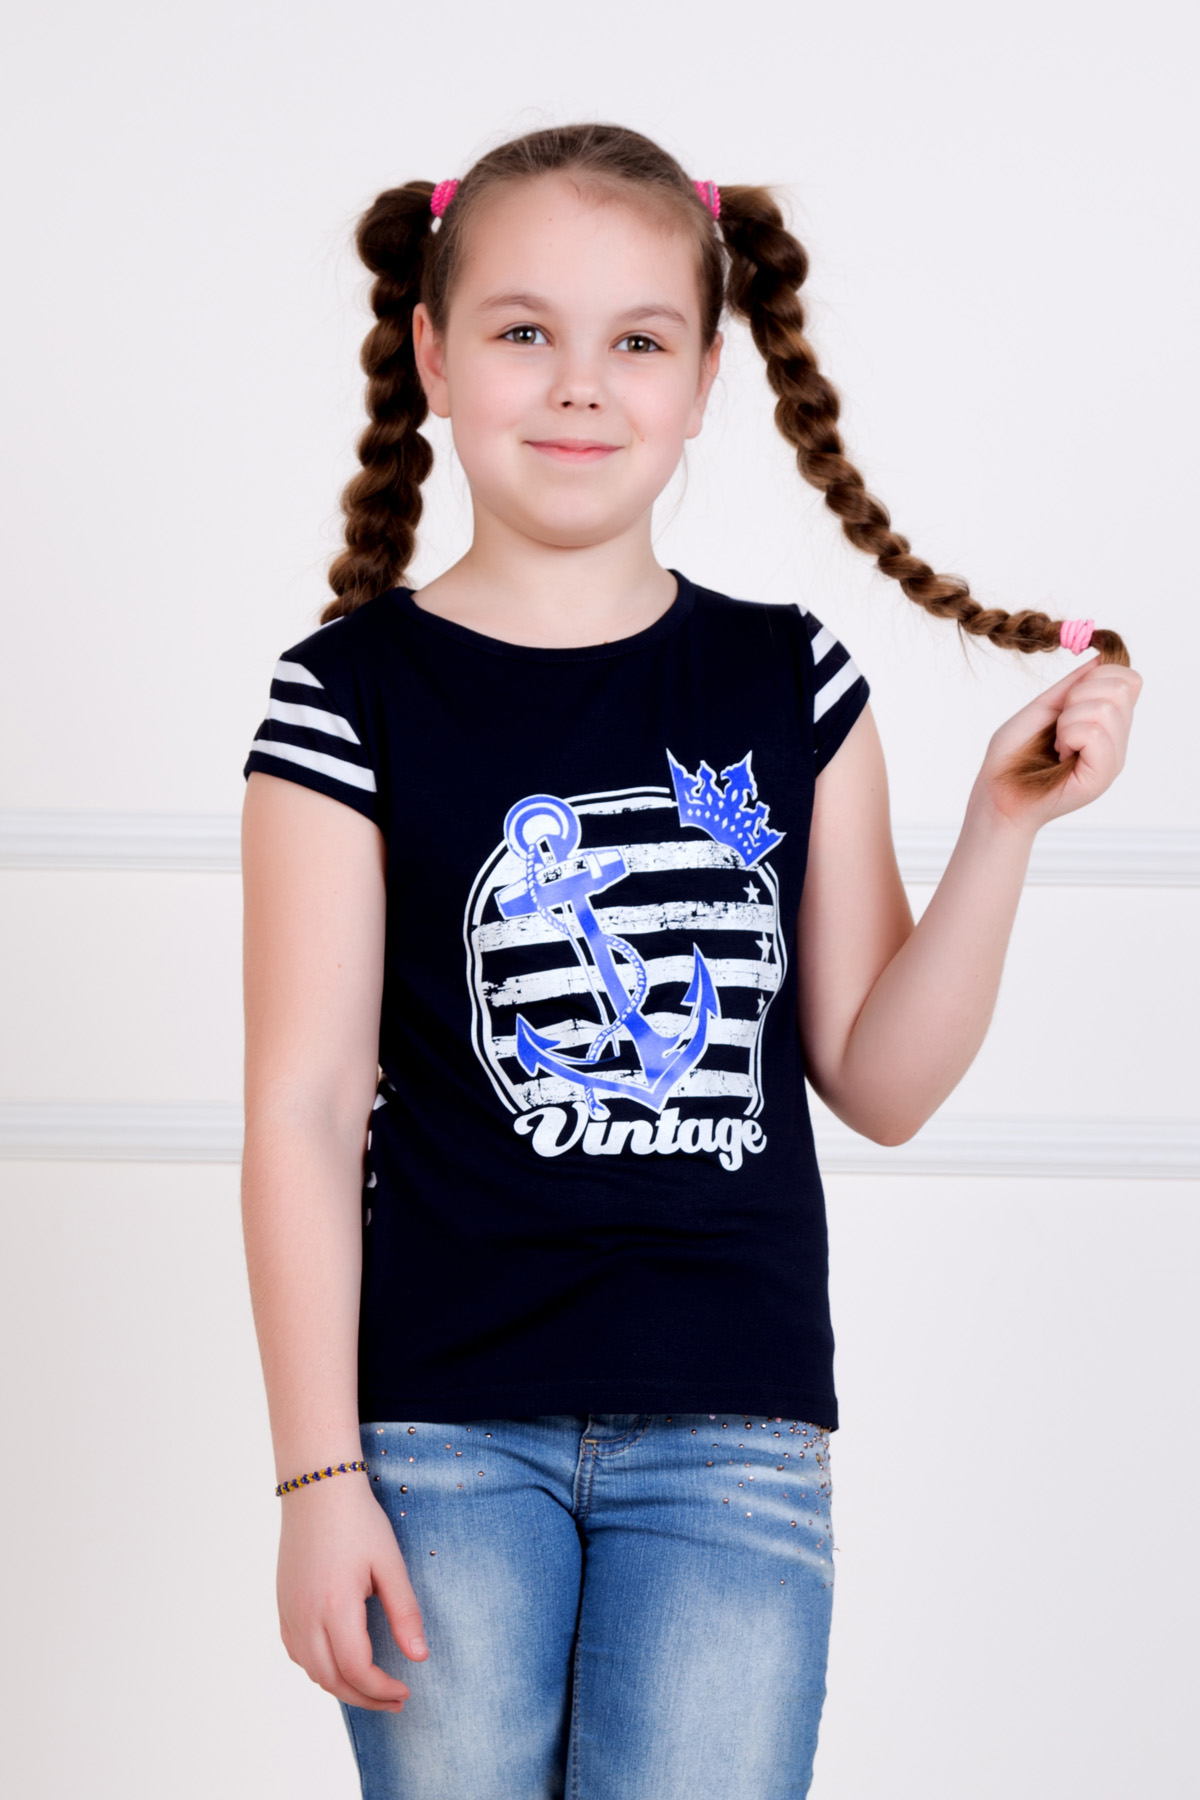 Дет. футболка Якорек р. 36Футболки и майки<br><br><br>Тип: Дет. футболка<br>Размер: 36<br>Материал: Вискоза